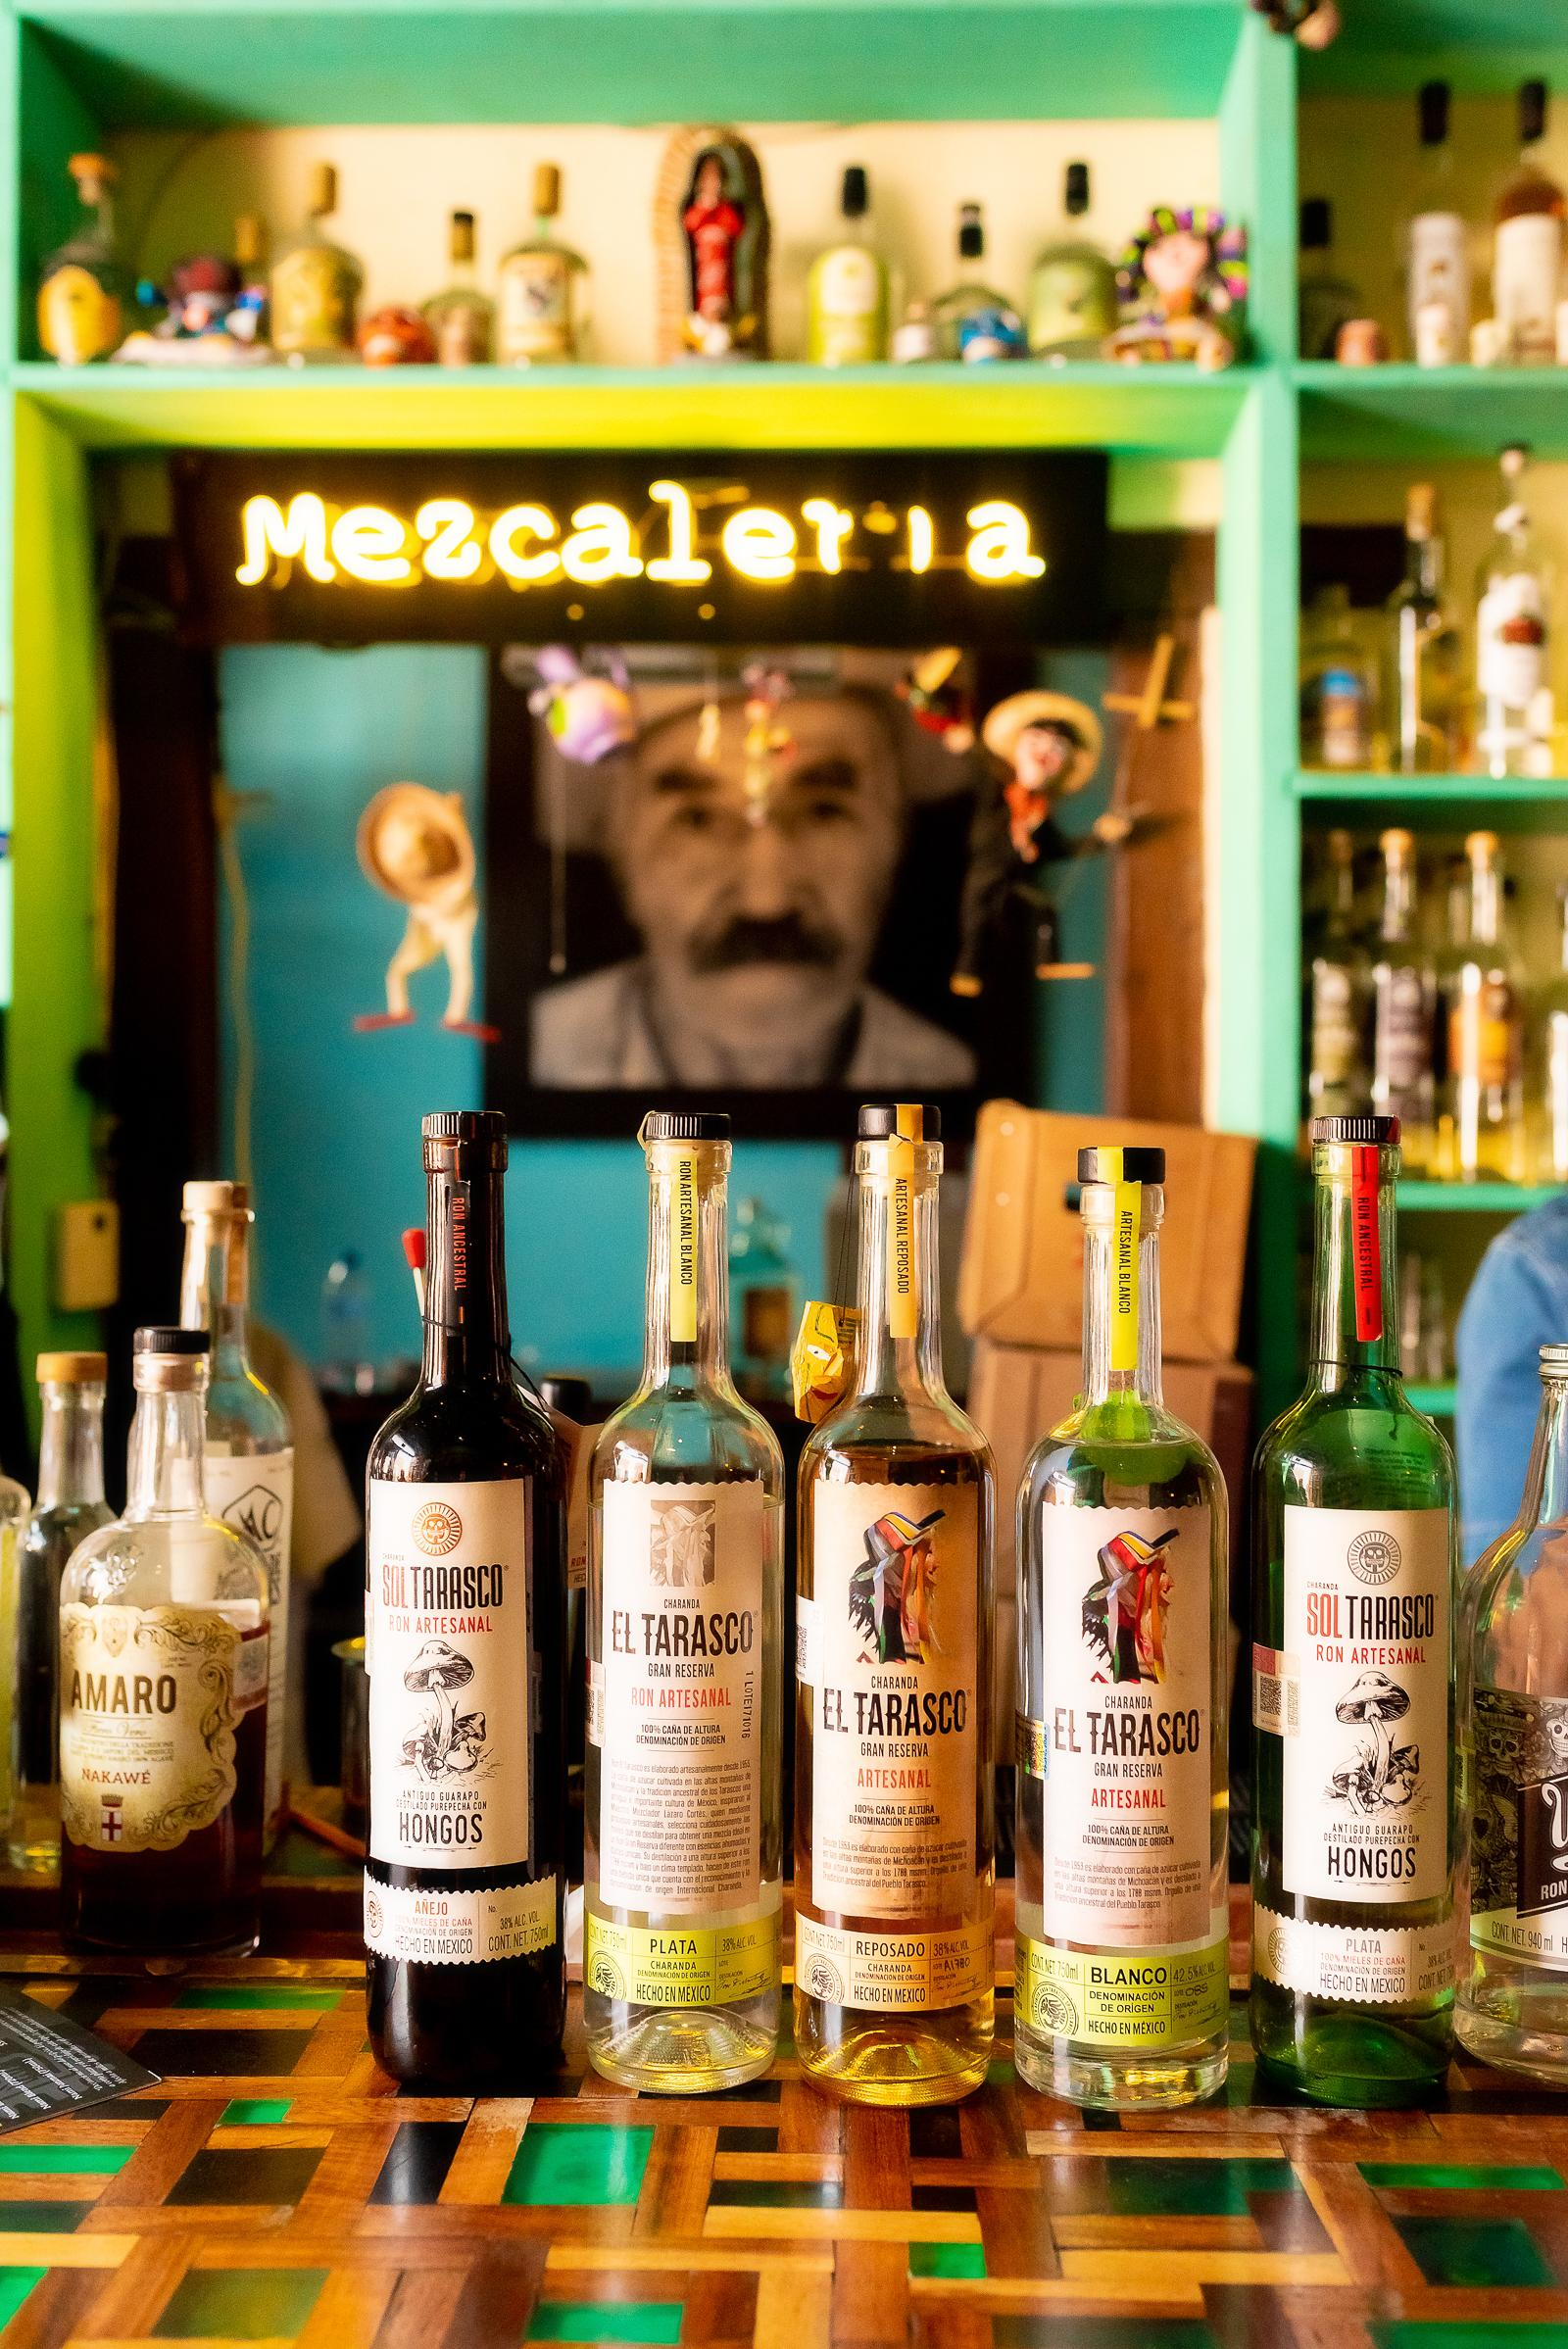 Tata Mezcaleria Morelia Mexico